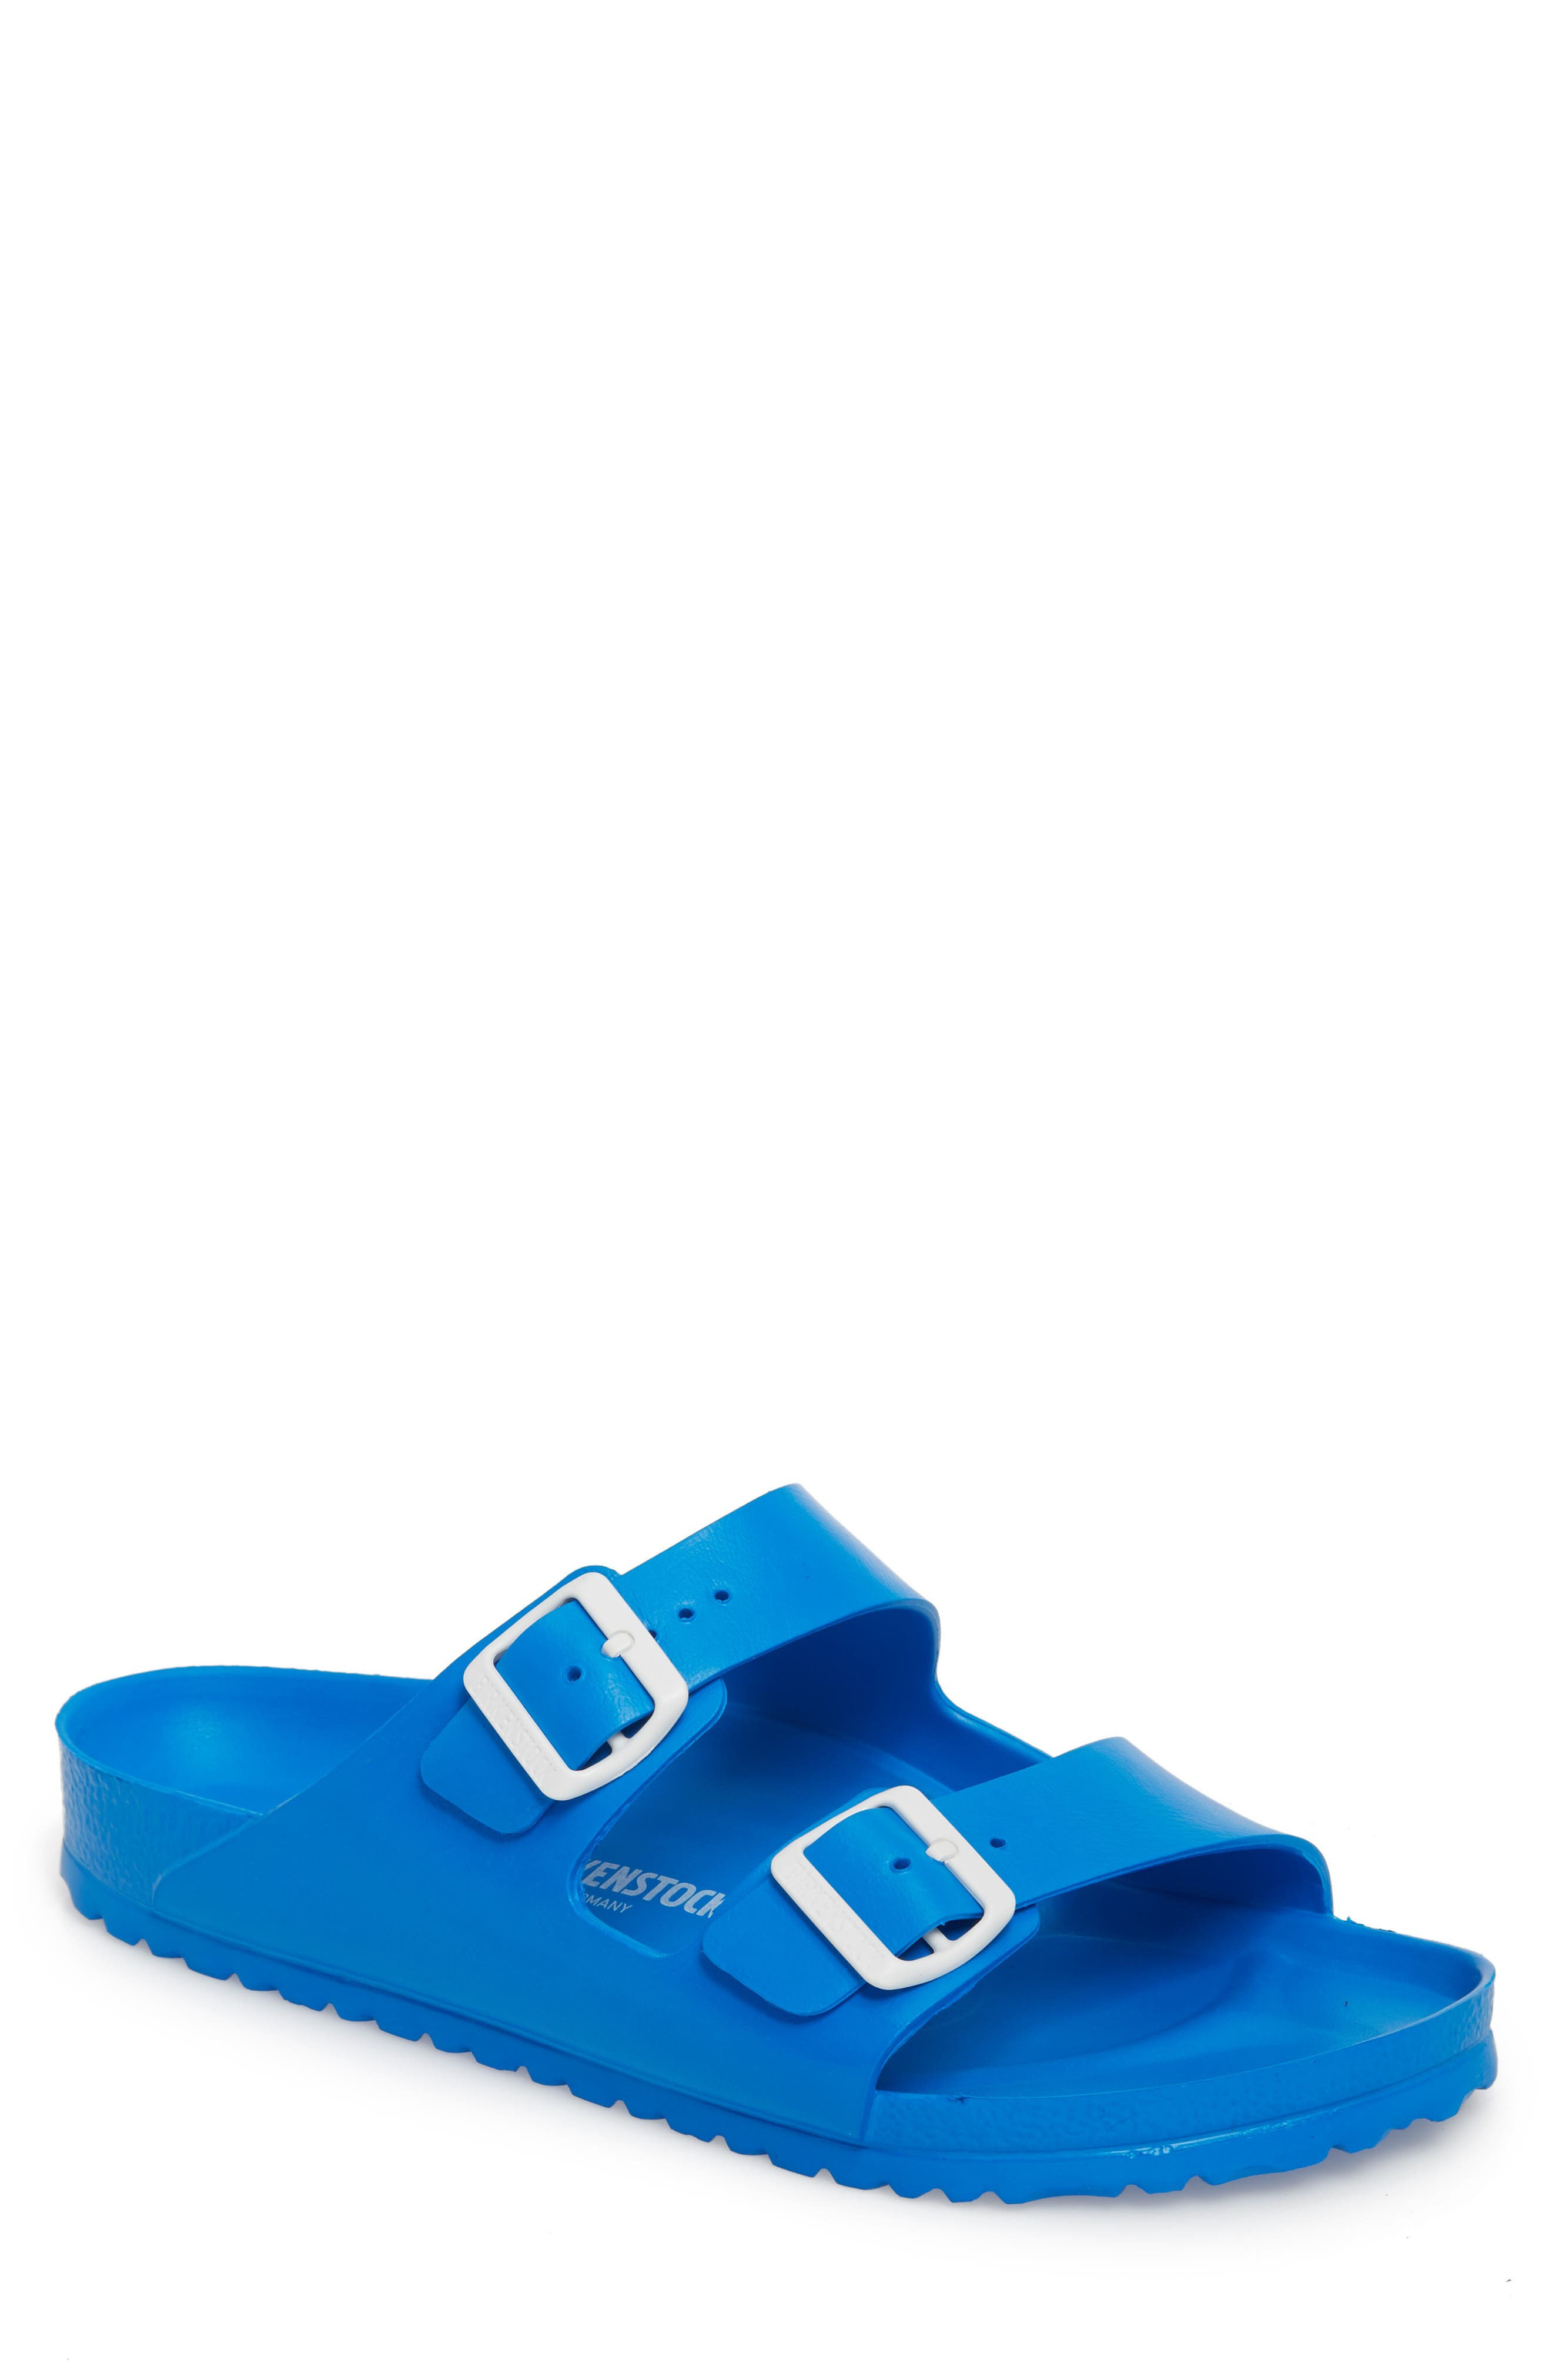 Birkenstock Essentials Arizona Eva Waterproof Slide Sandal,10.5 - Blue